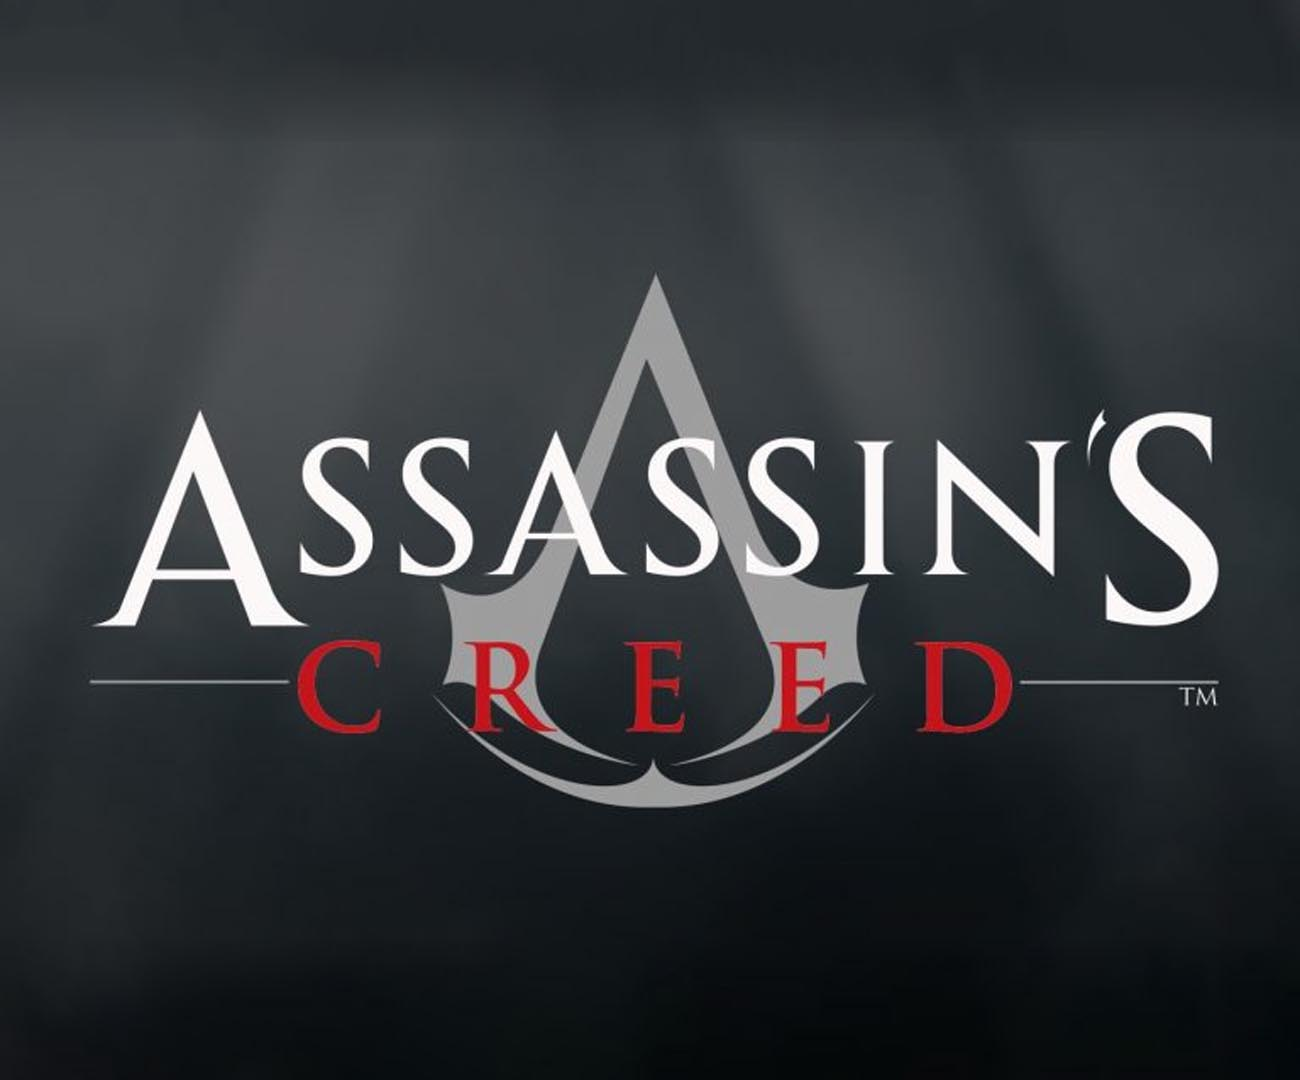 assassins creed 2022